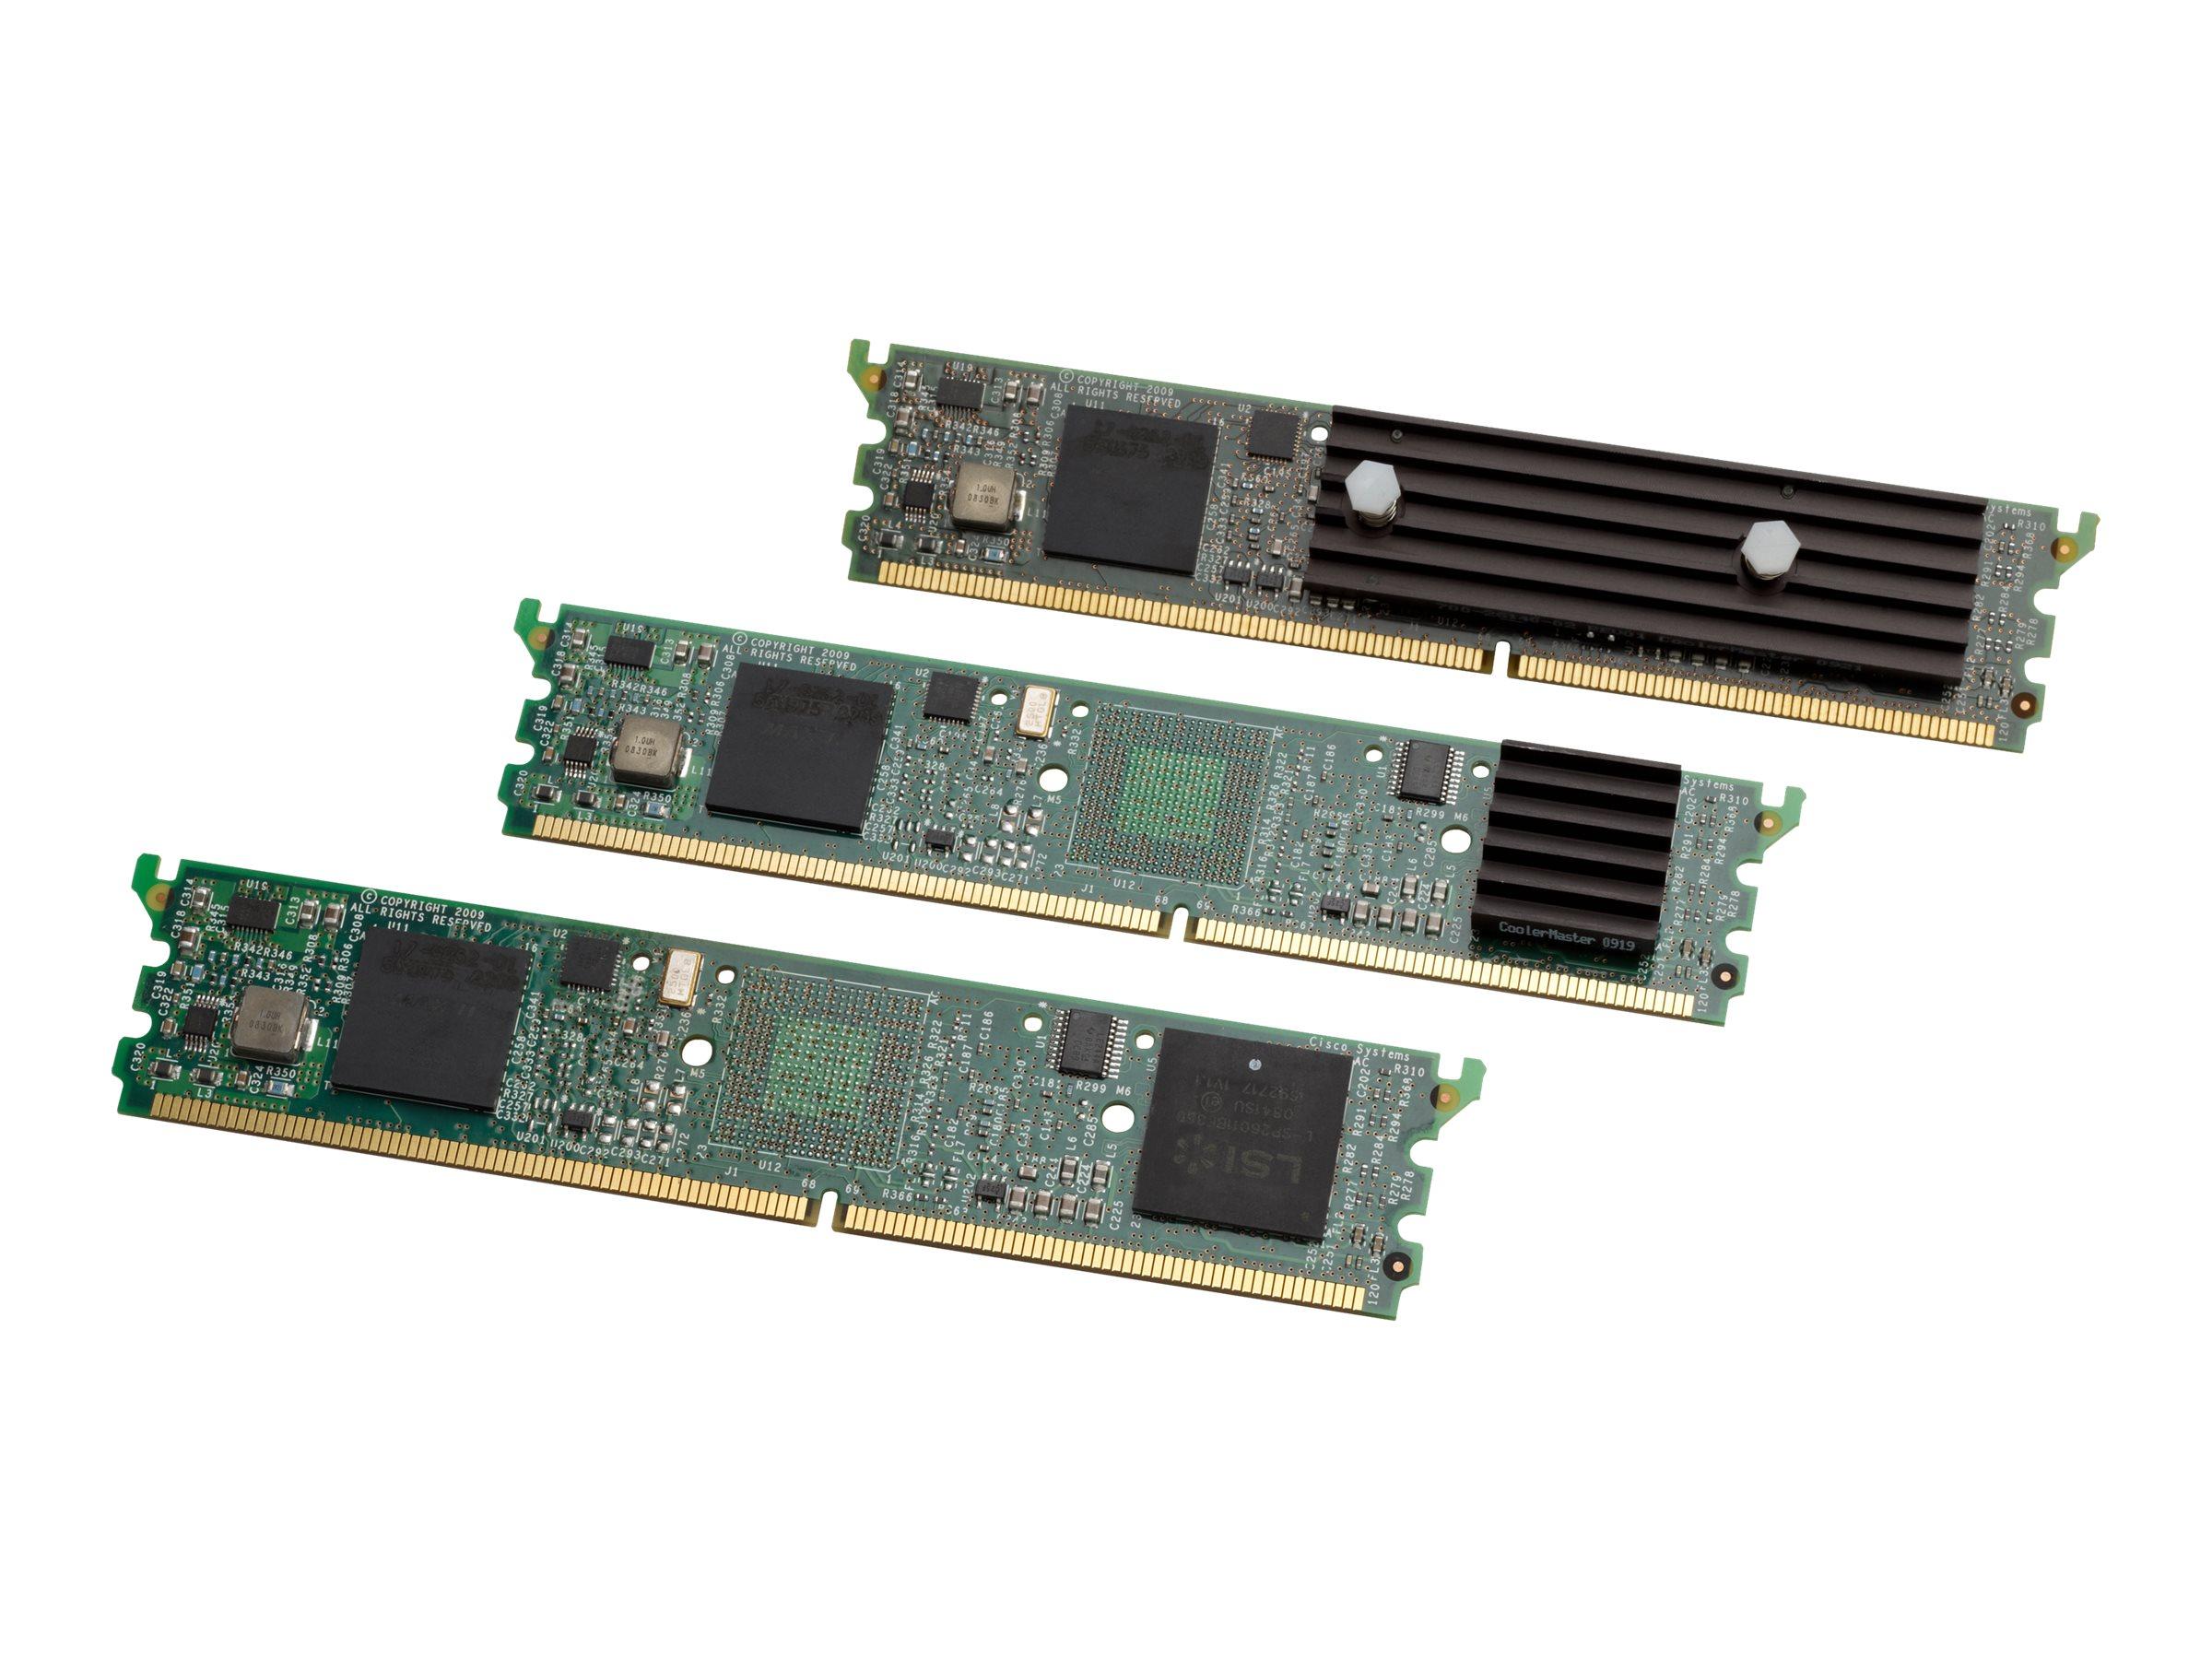 Cisco PVDM3 32 to 128 Channel Factory Upgrade